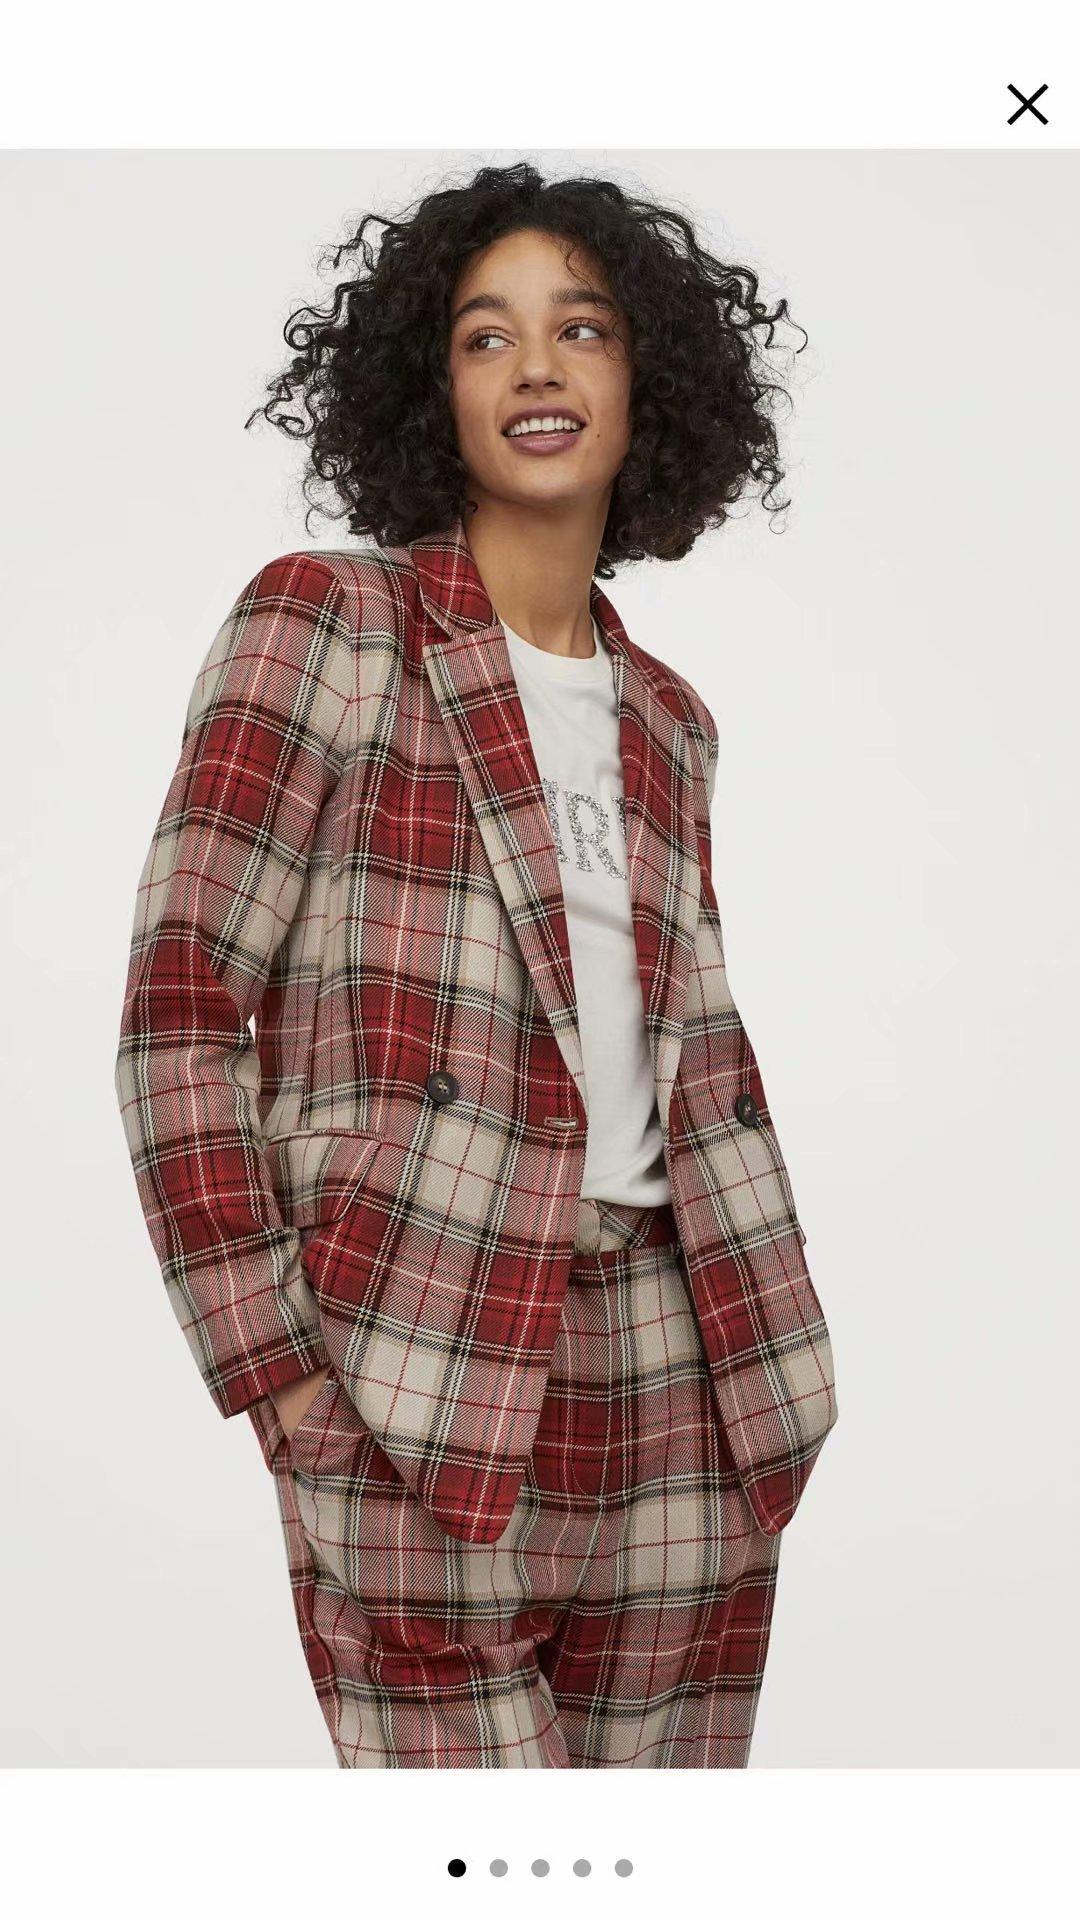 2020 nova primavera verão grade vermelha europeia duplo breasted za feminino terno jaqueta casaco zanzeaing sheining terno feminino dft27546